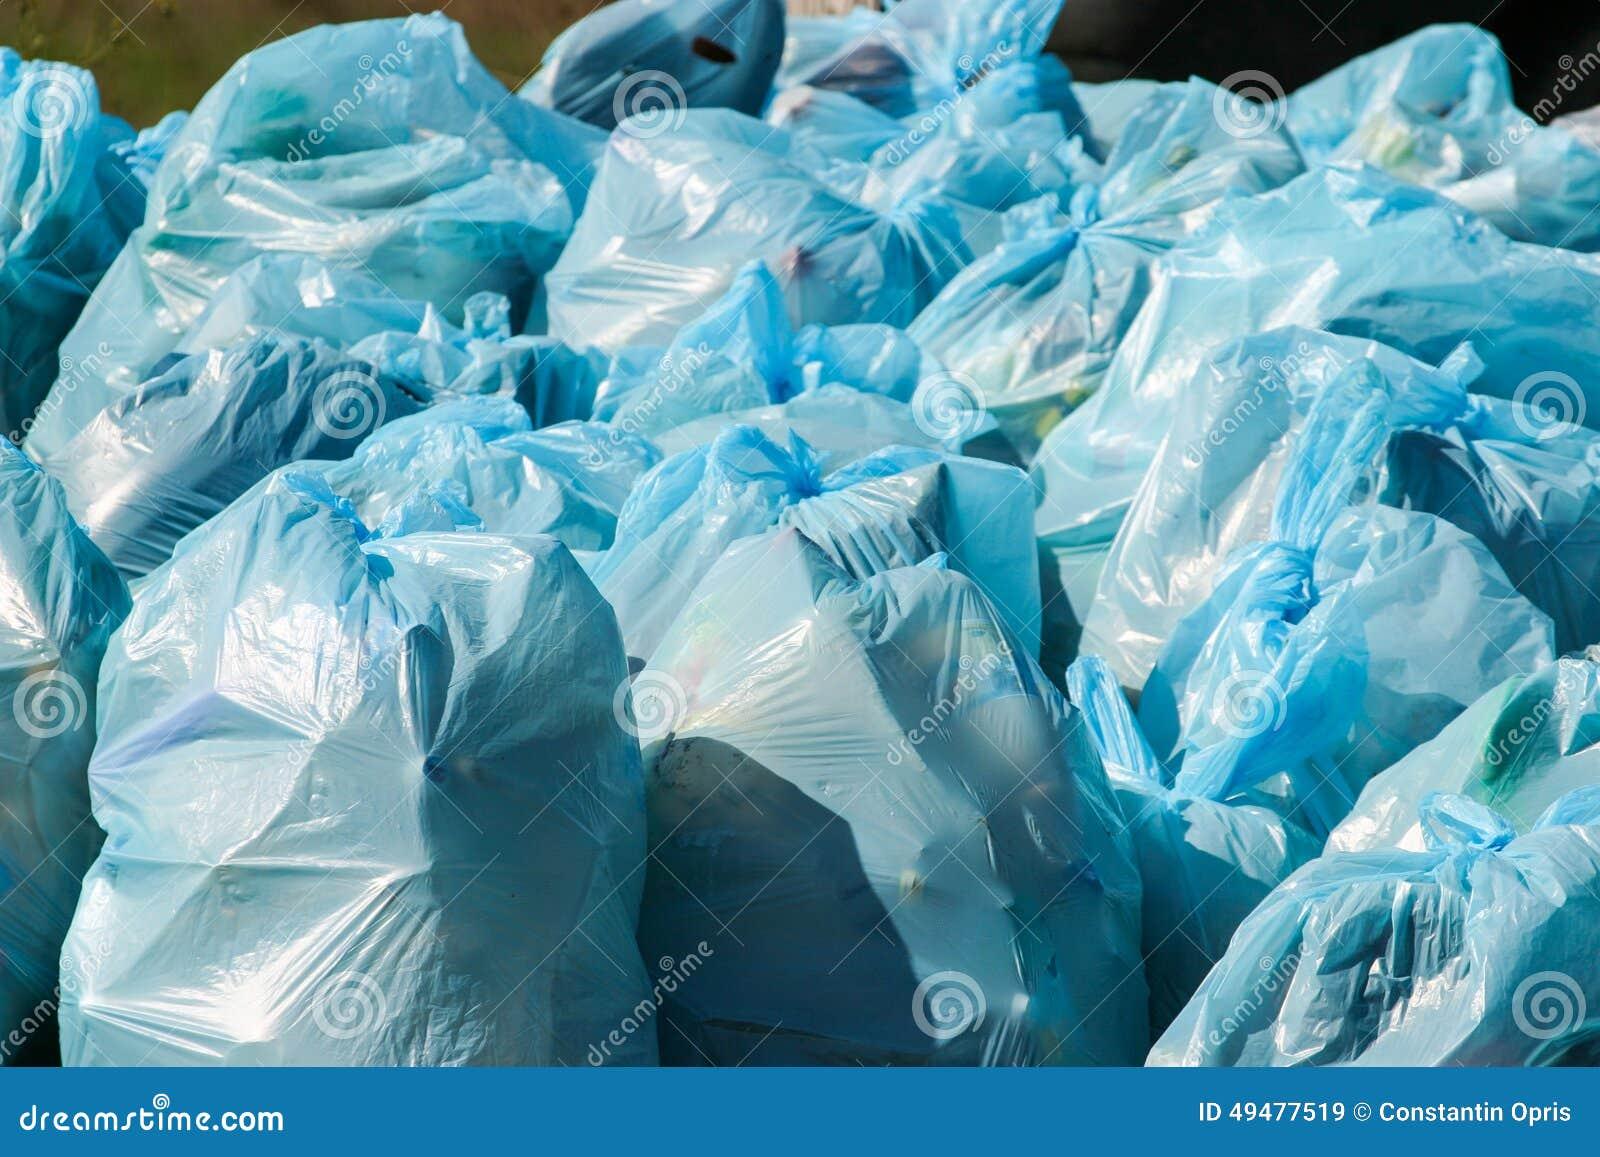 Pile Of Garbage Bags Stock Photo - Image: 49477519